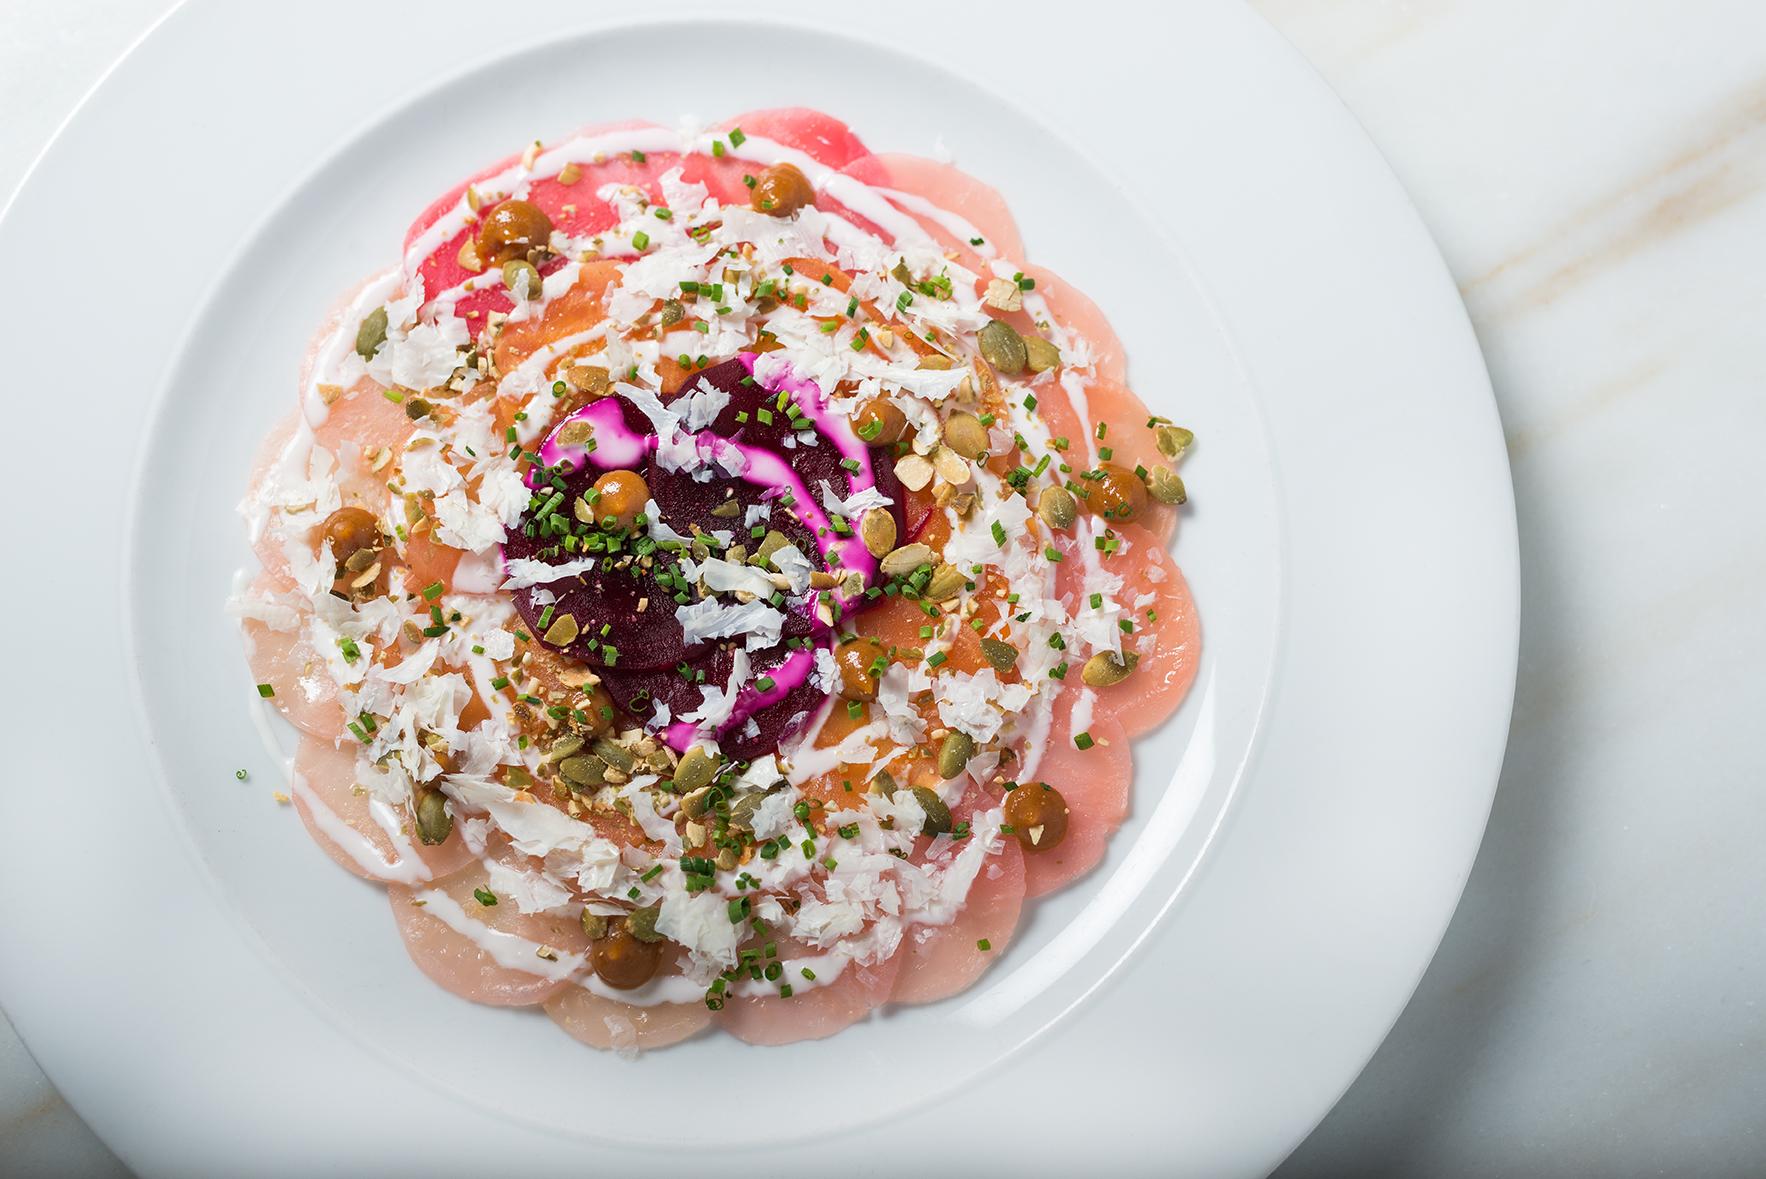 Blink_beet salad overhead